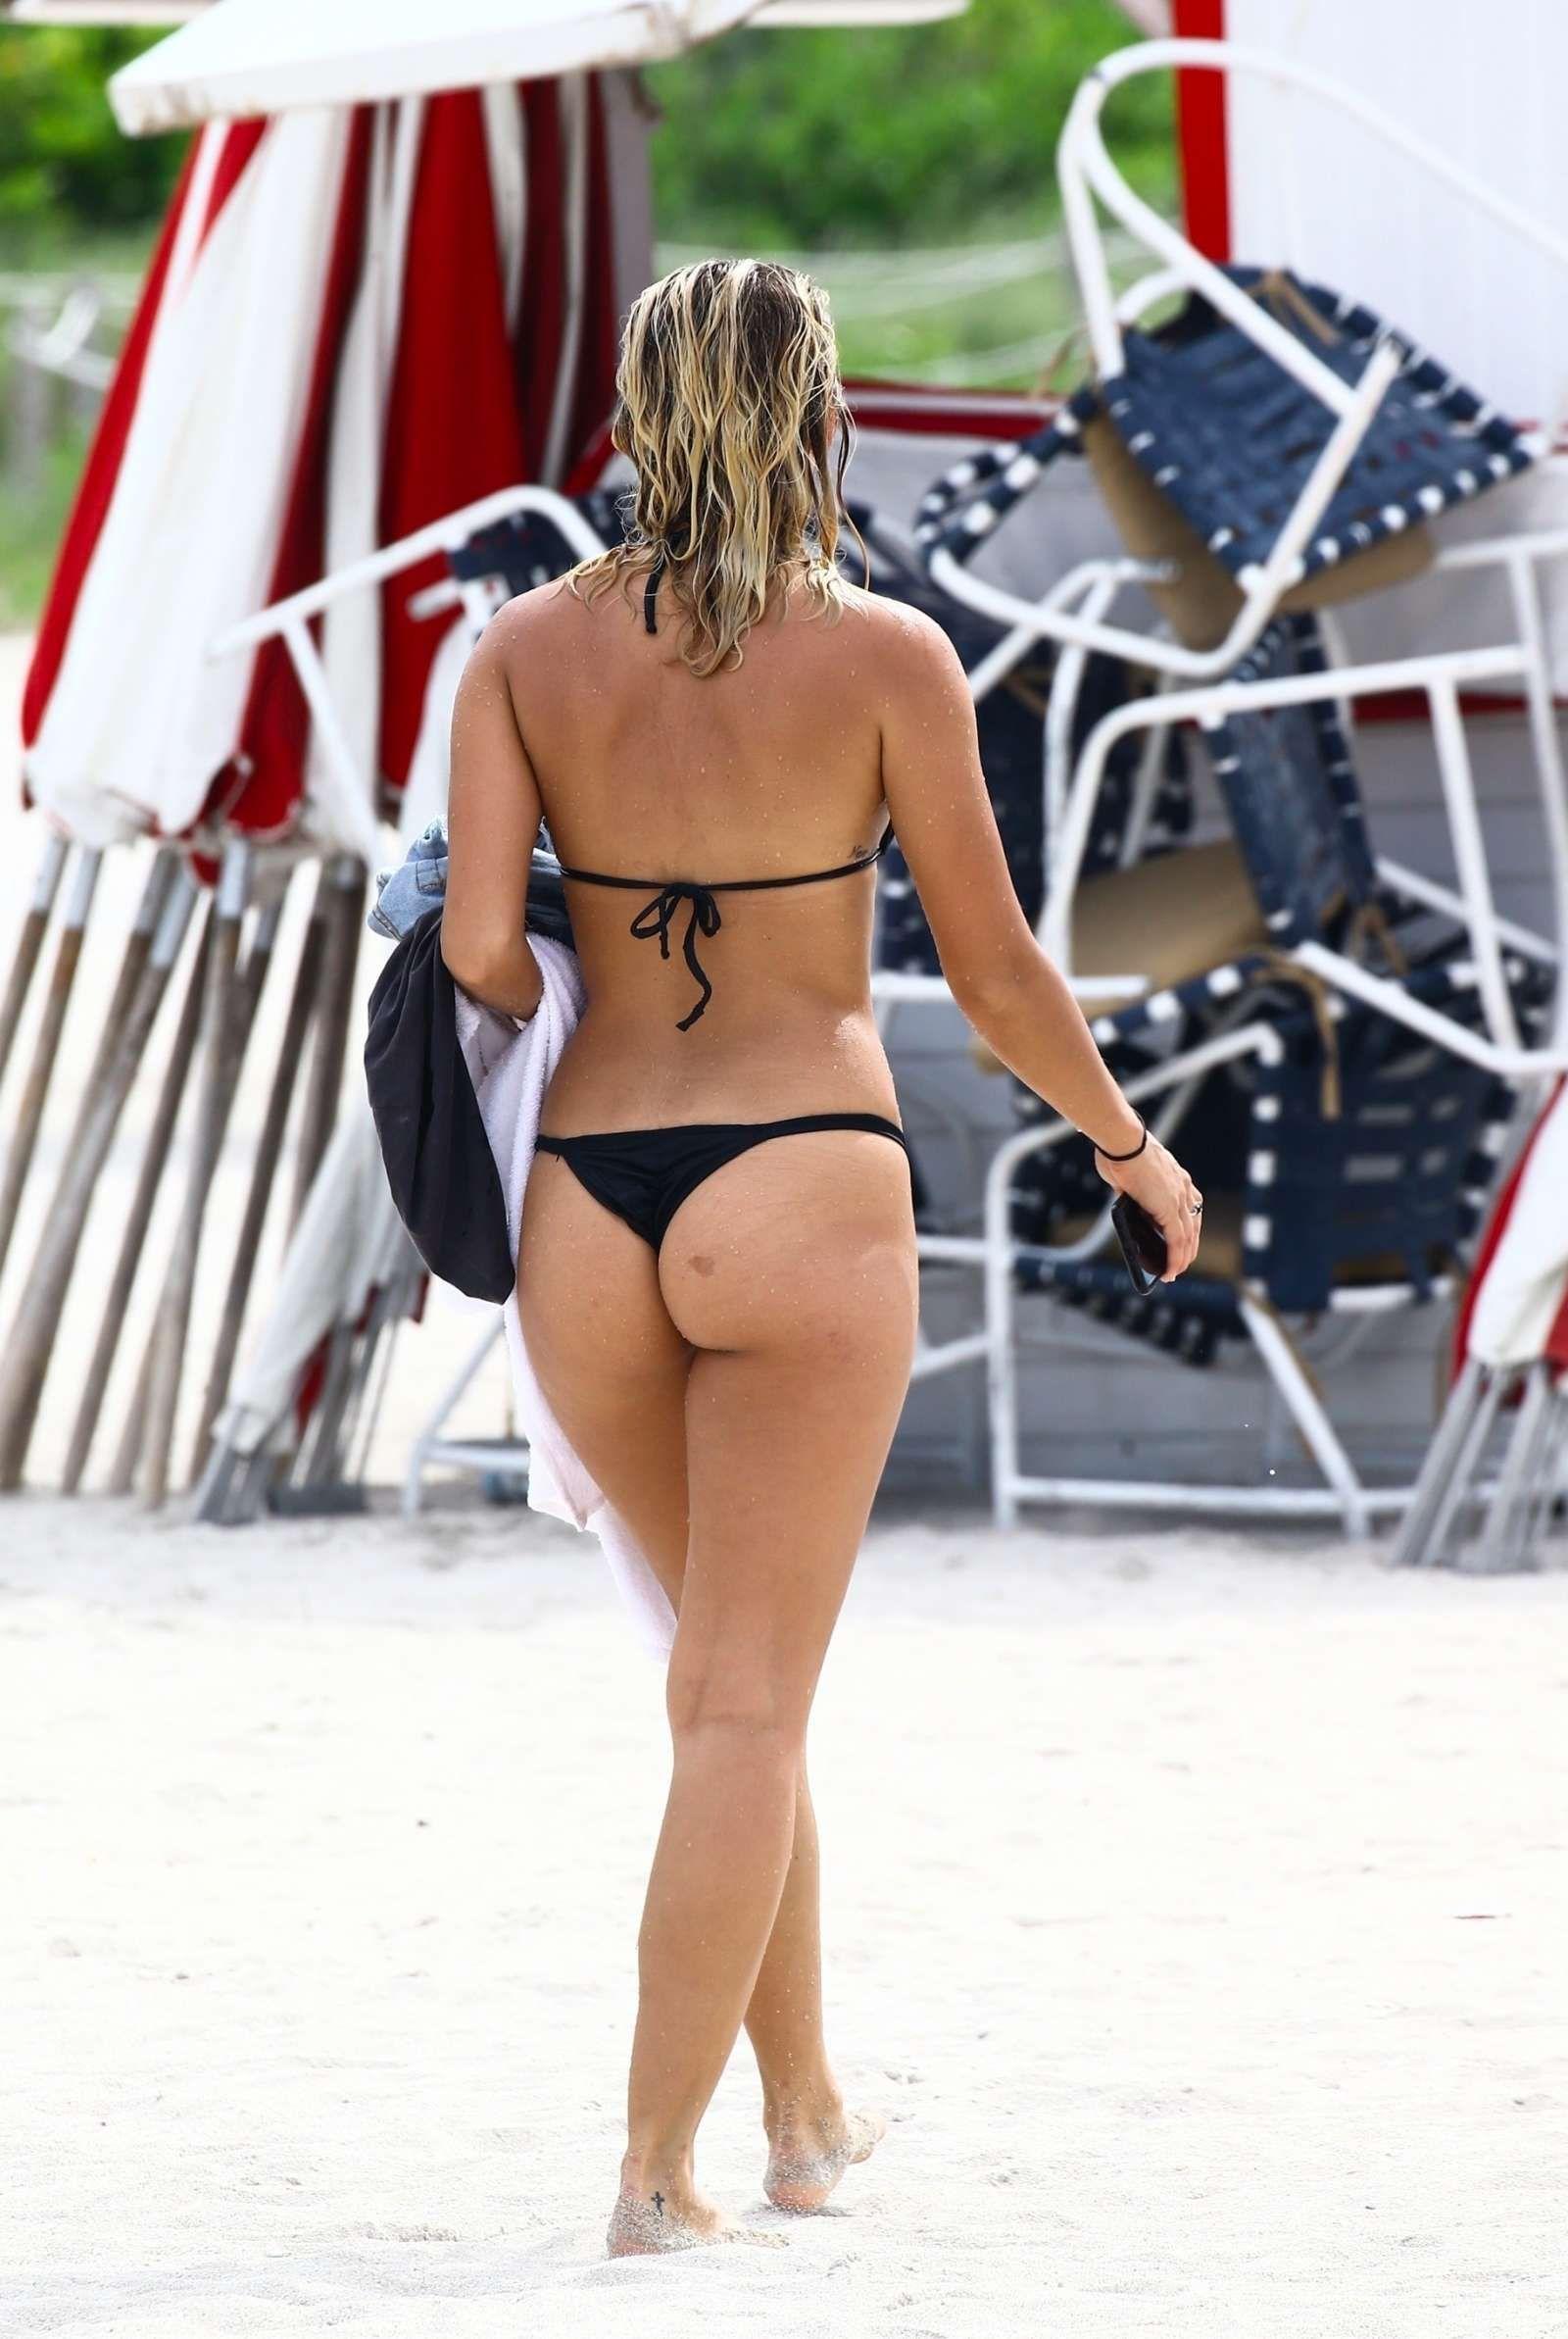 ICloud Alesya Kafelnikova nude (17 photos), Bikini